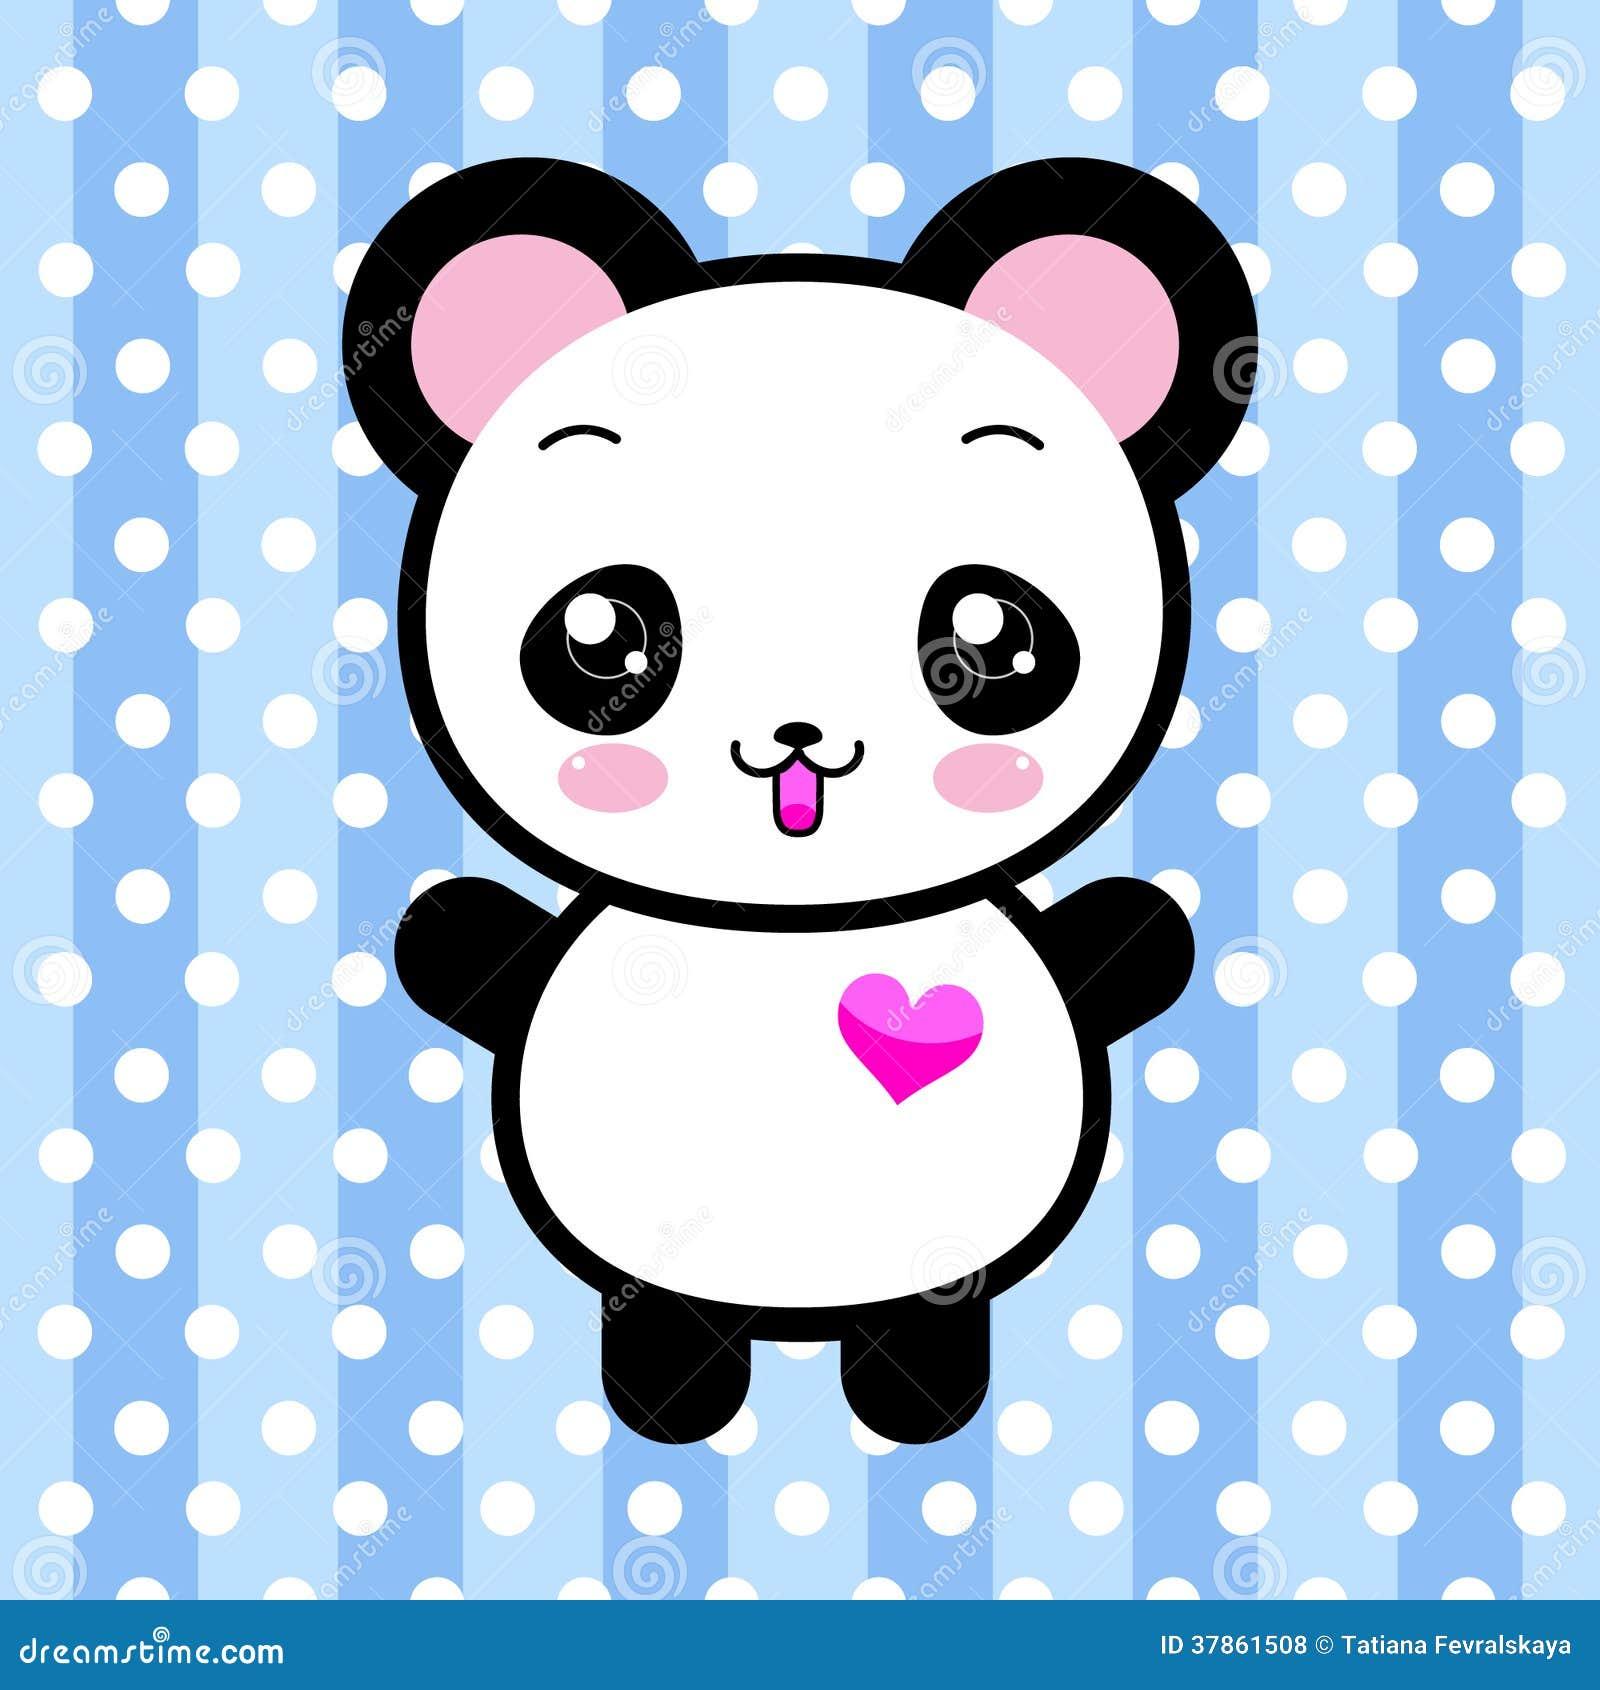 Cute anime panda pics